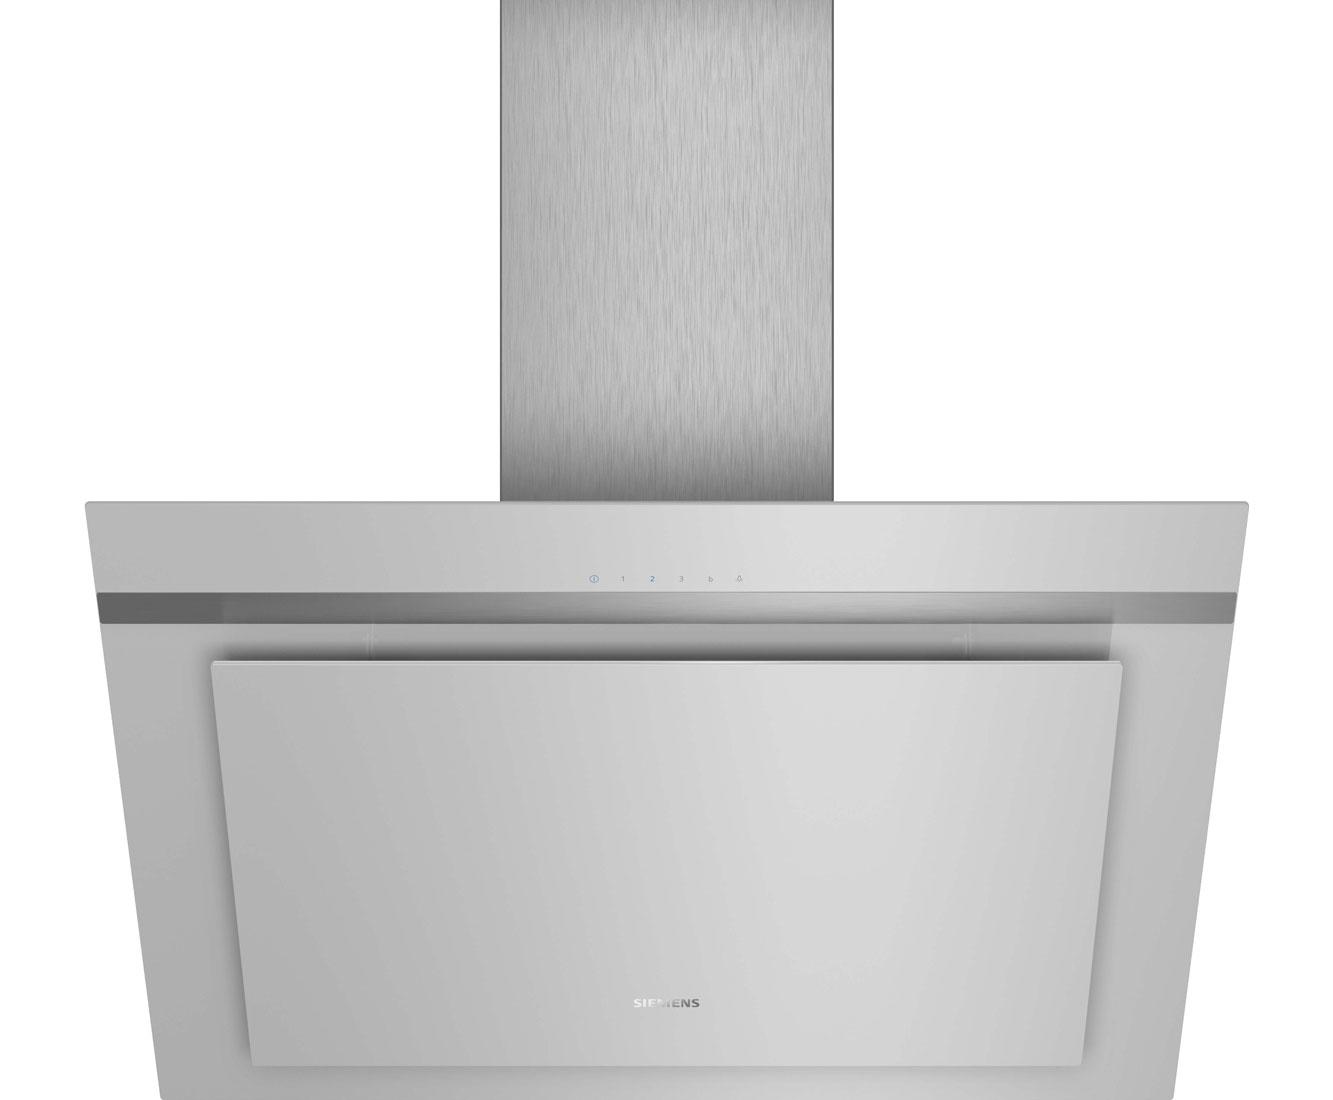 Aqua wall mounted von elica s p a dunstabzugshauben ambista